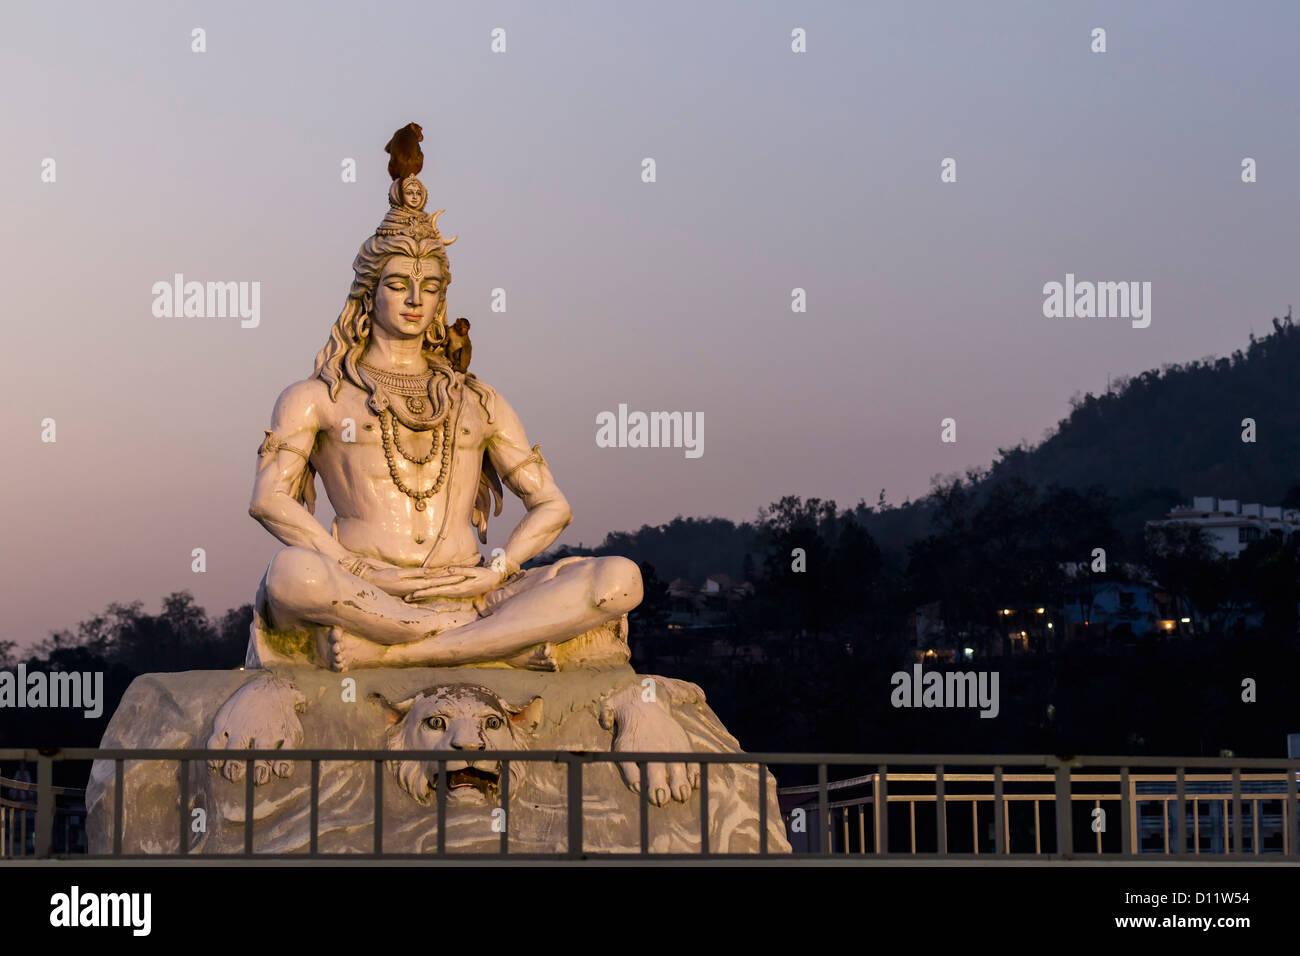 India, Uttarakhand, Rishikesh, Lord shiva statue at River Ganges - Stock Image